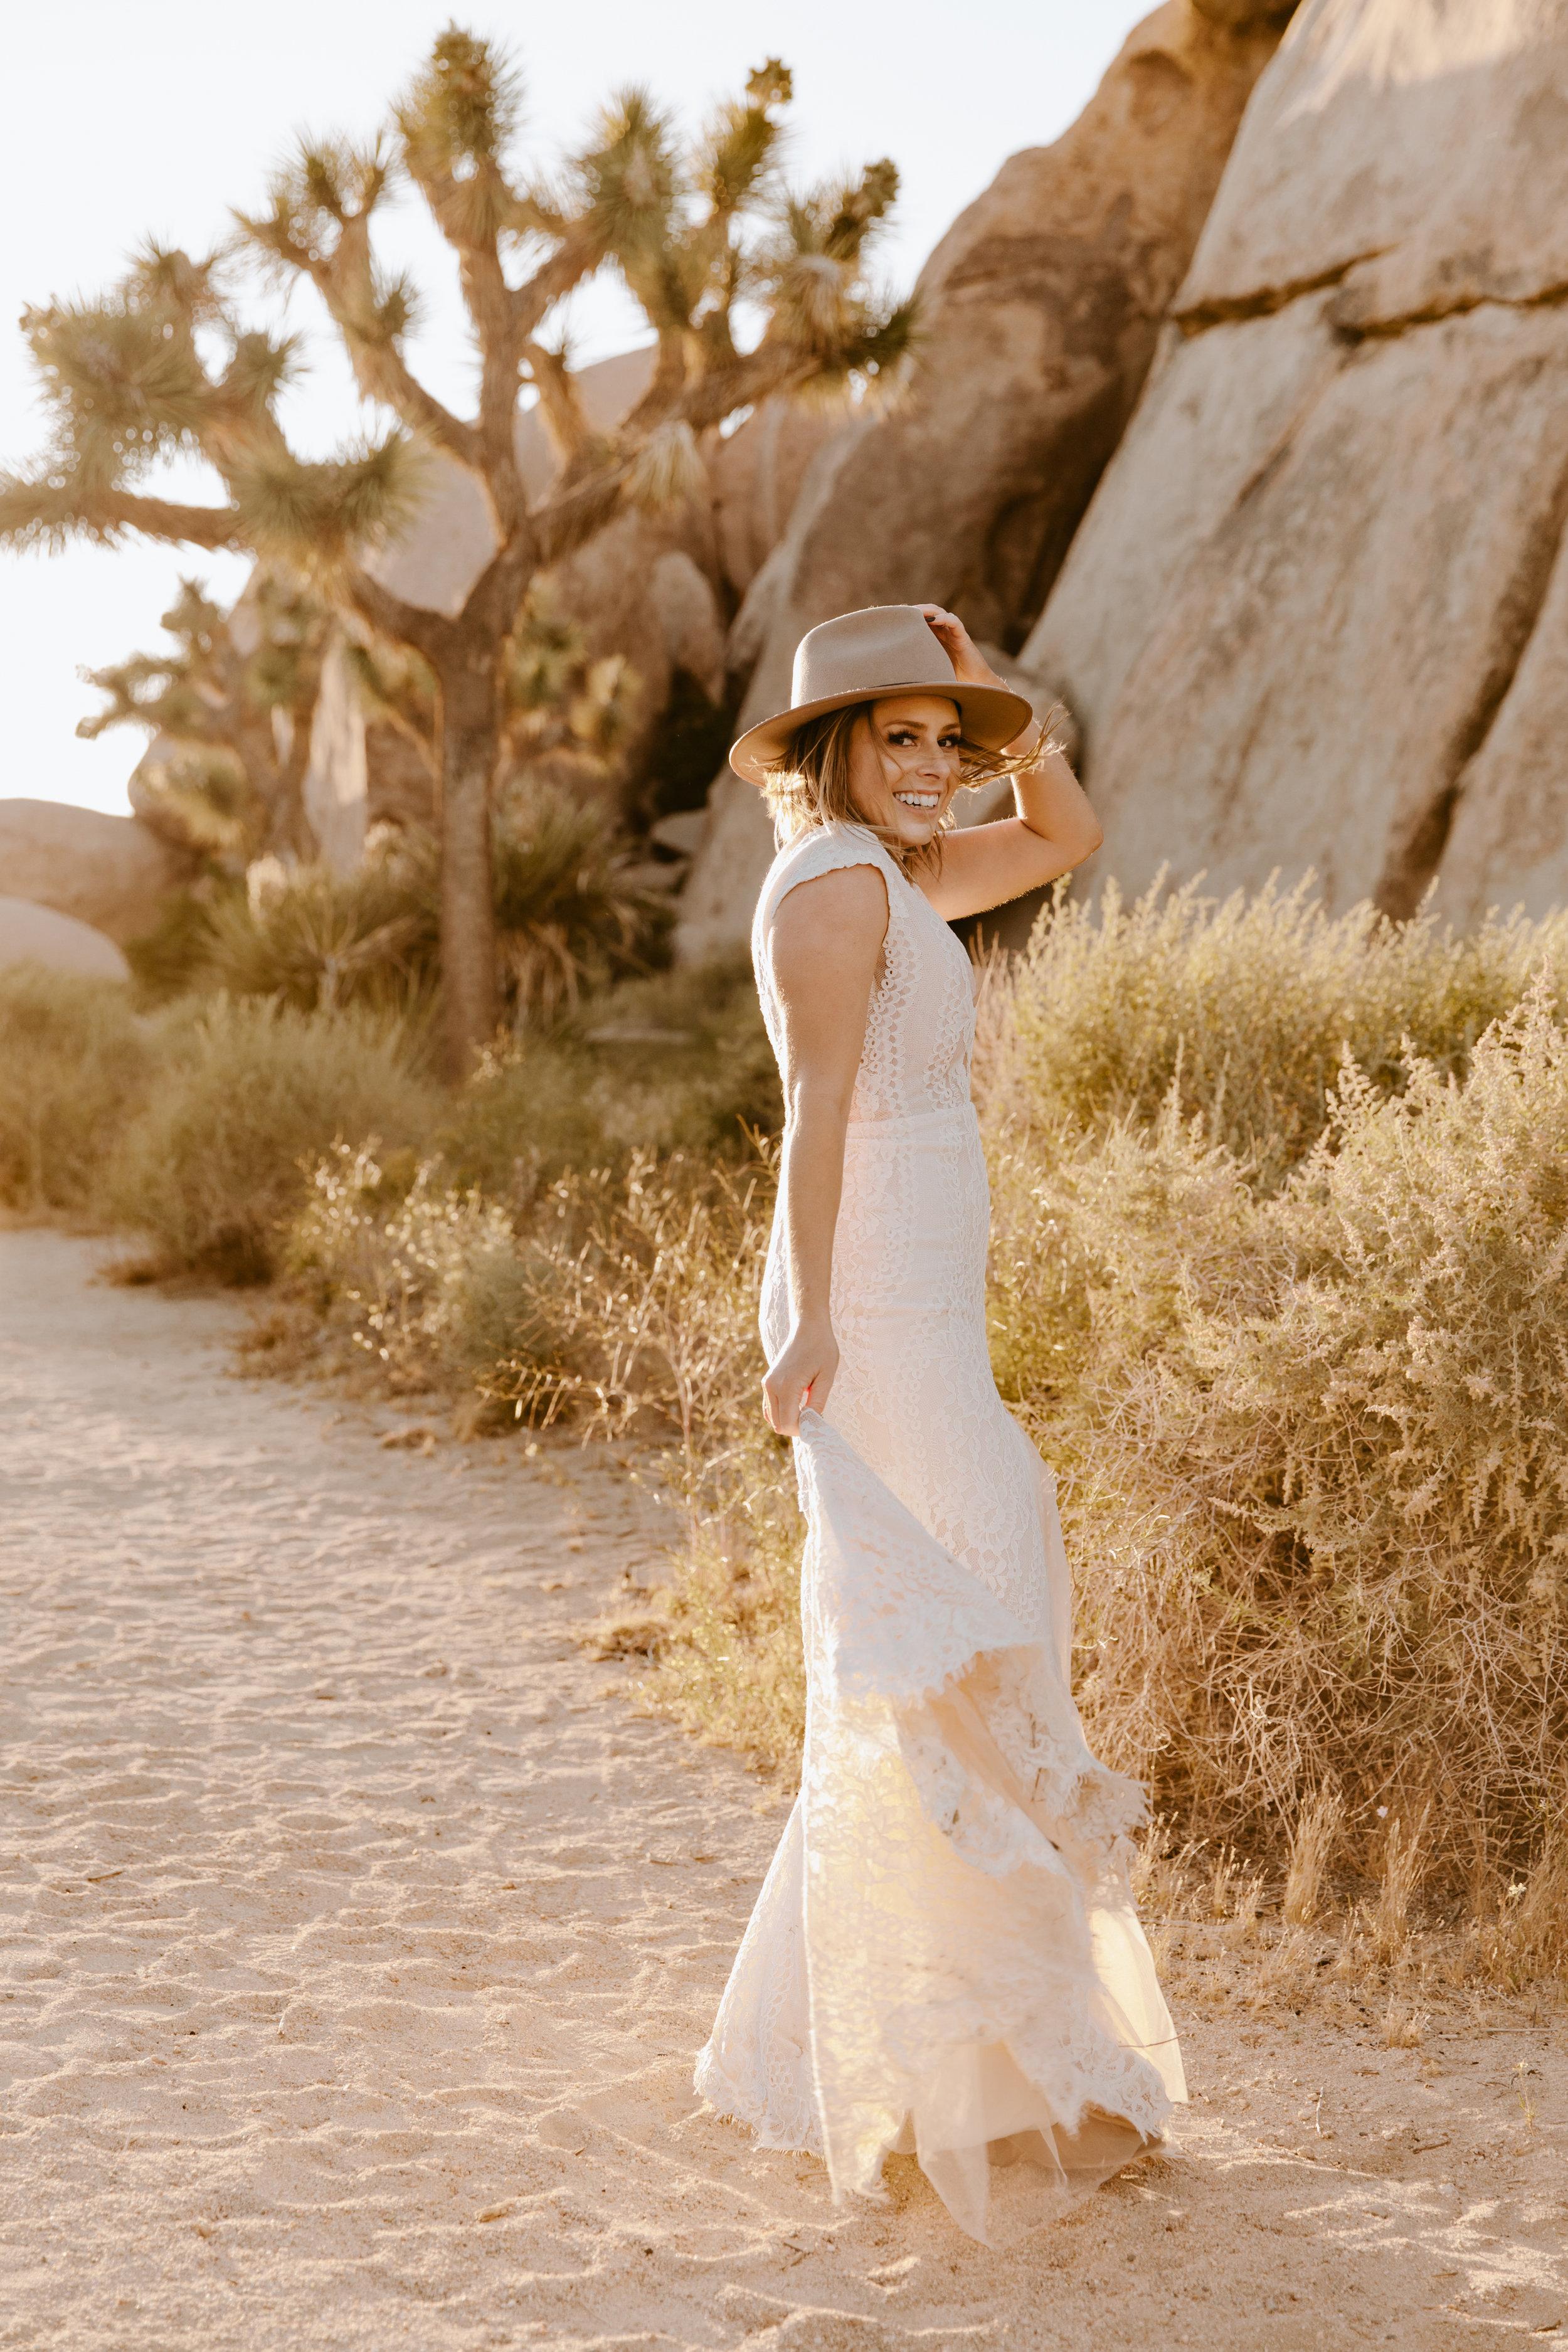 2019-05-26_Callie-Evan_Wedding_Joshua Tree_Paige Nelson_PREVIEWS HR-61.jpg